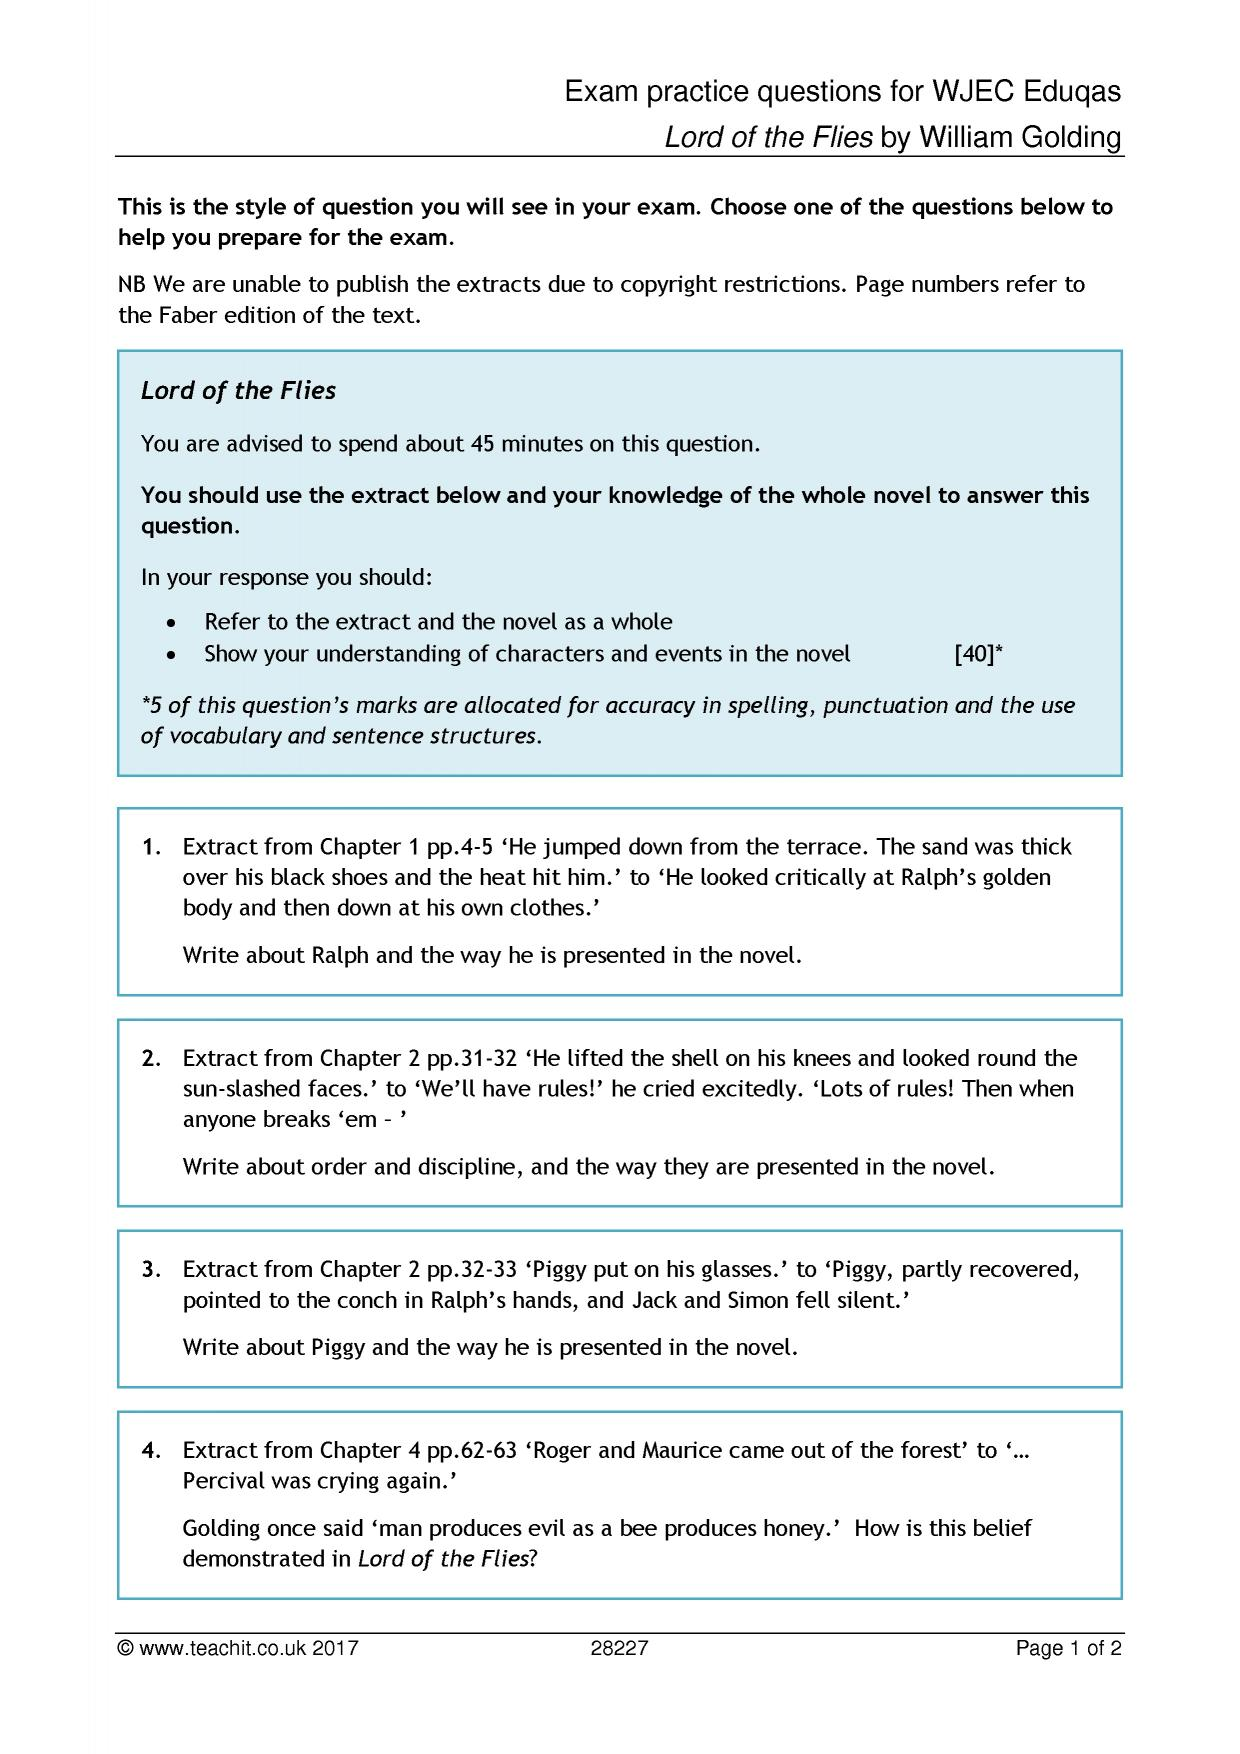 Exam Practice Questions For Wjec Eduqas